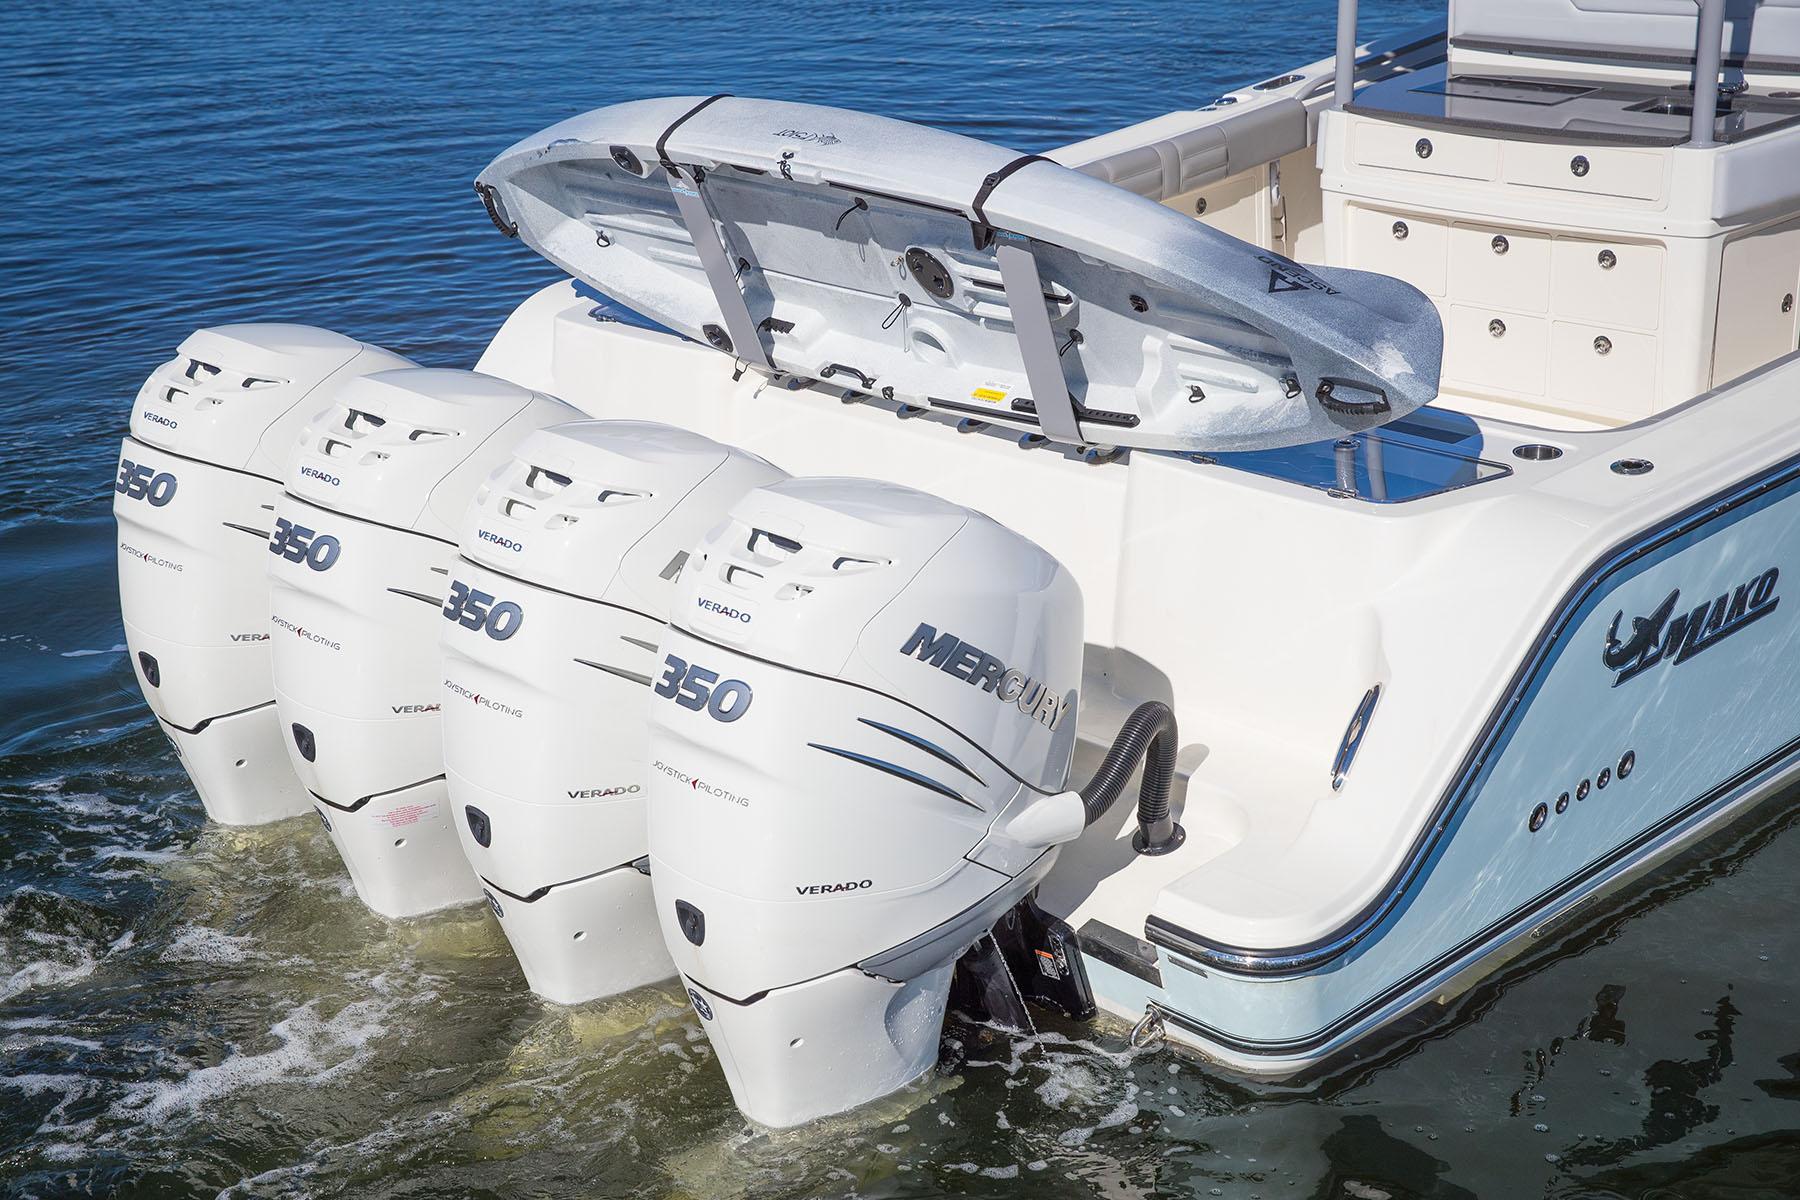 _2019_MAKO_1912019_Offshore-Boats_193201